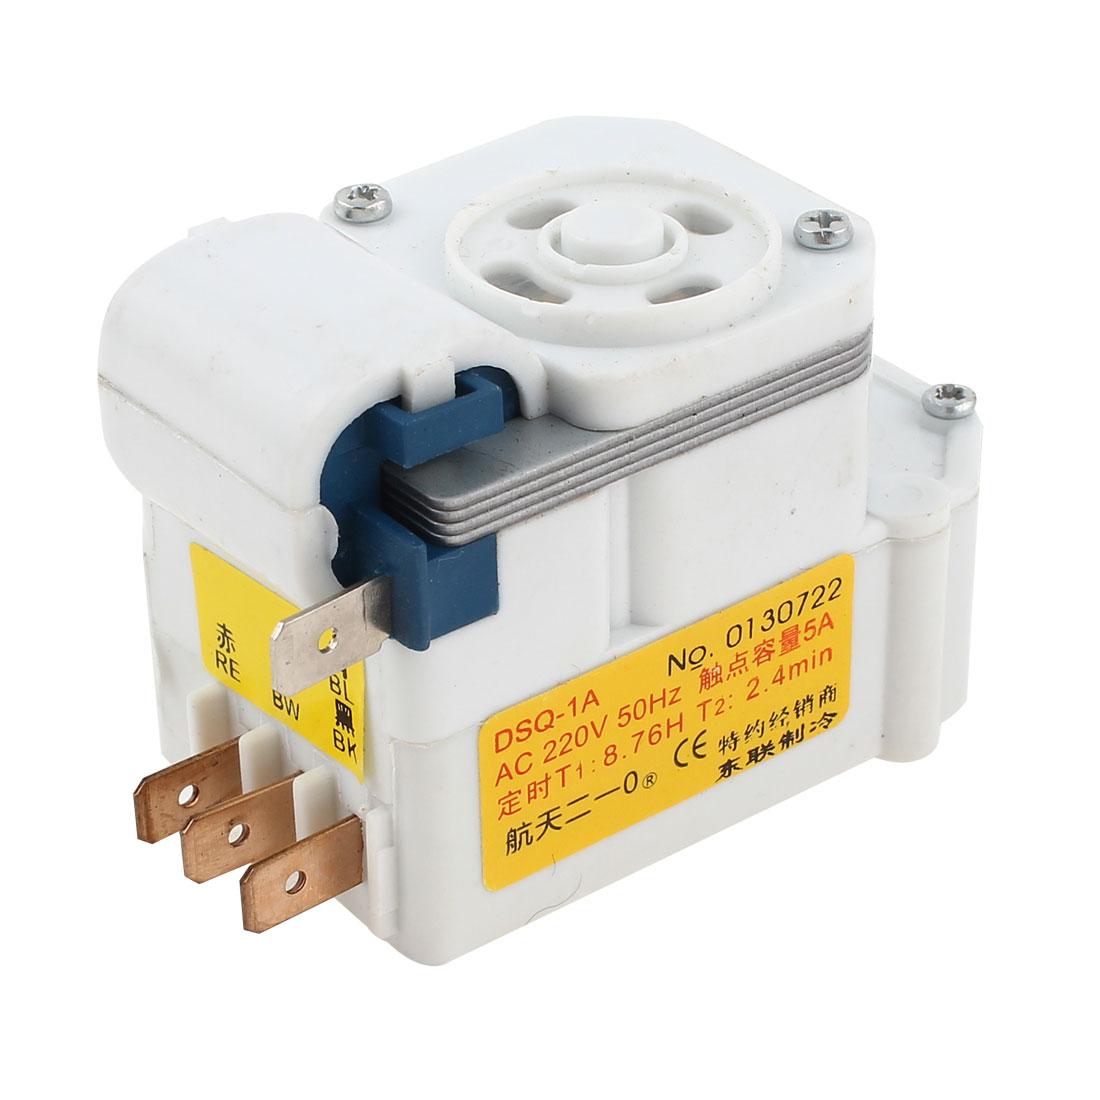 AC 220V DSQ-1A 4 Pins Refrigerator Fridge Defrost Timer